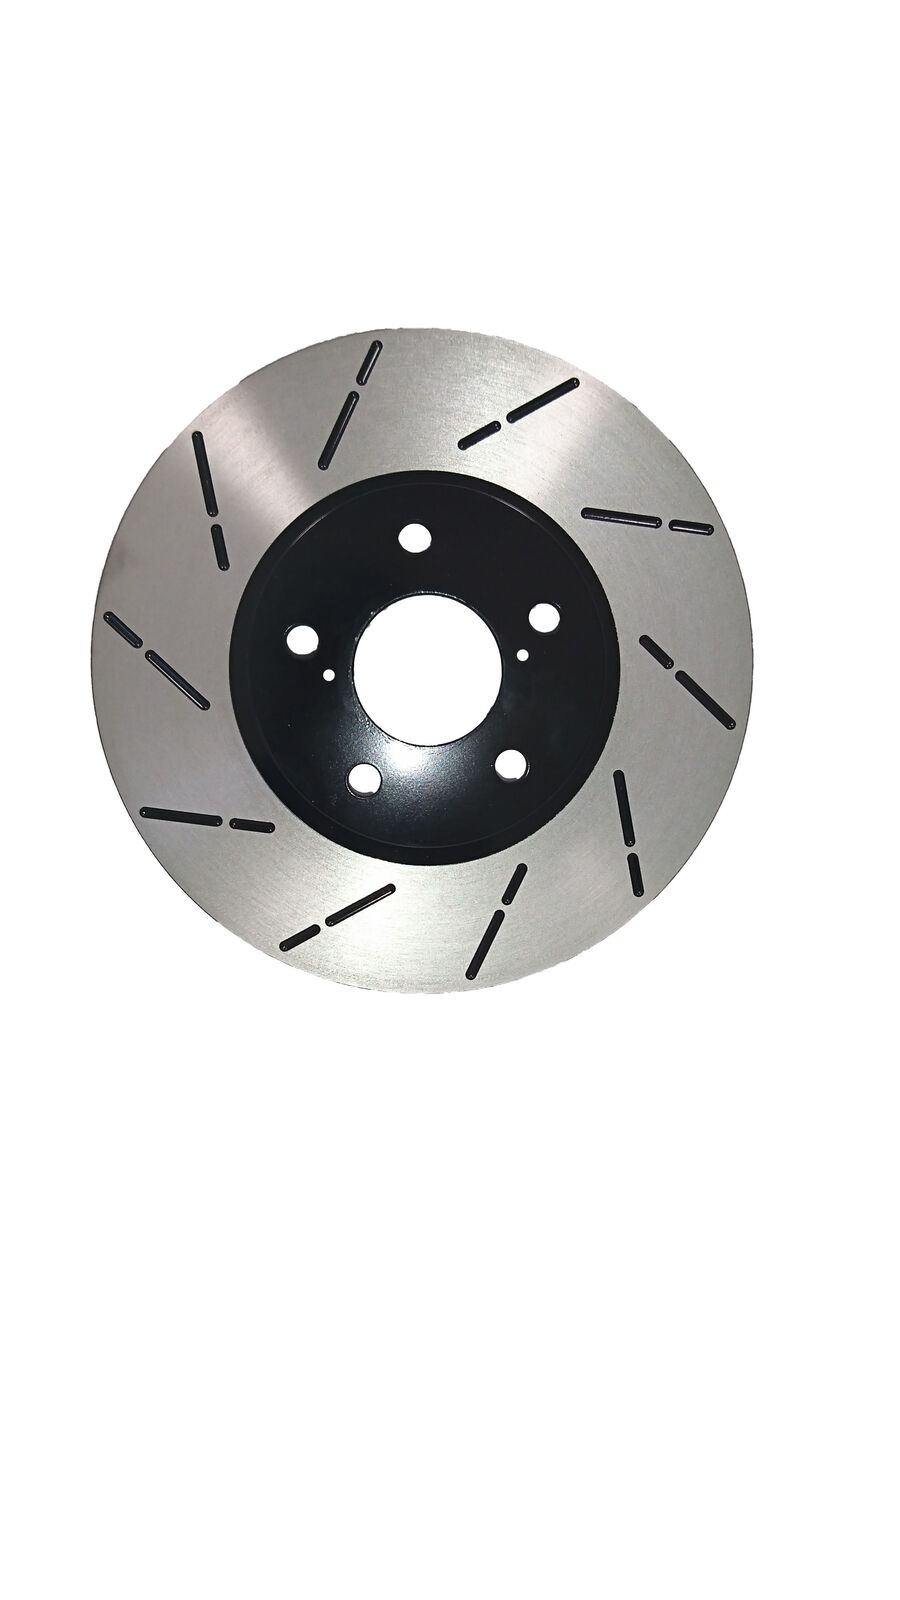 Fit 06-13 Toyota RAV4 V6 Front Premium E-Coat Slott Brake Rotors Ceramic Pads